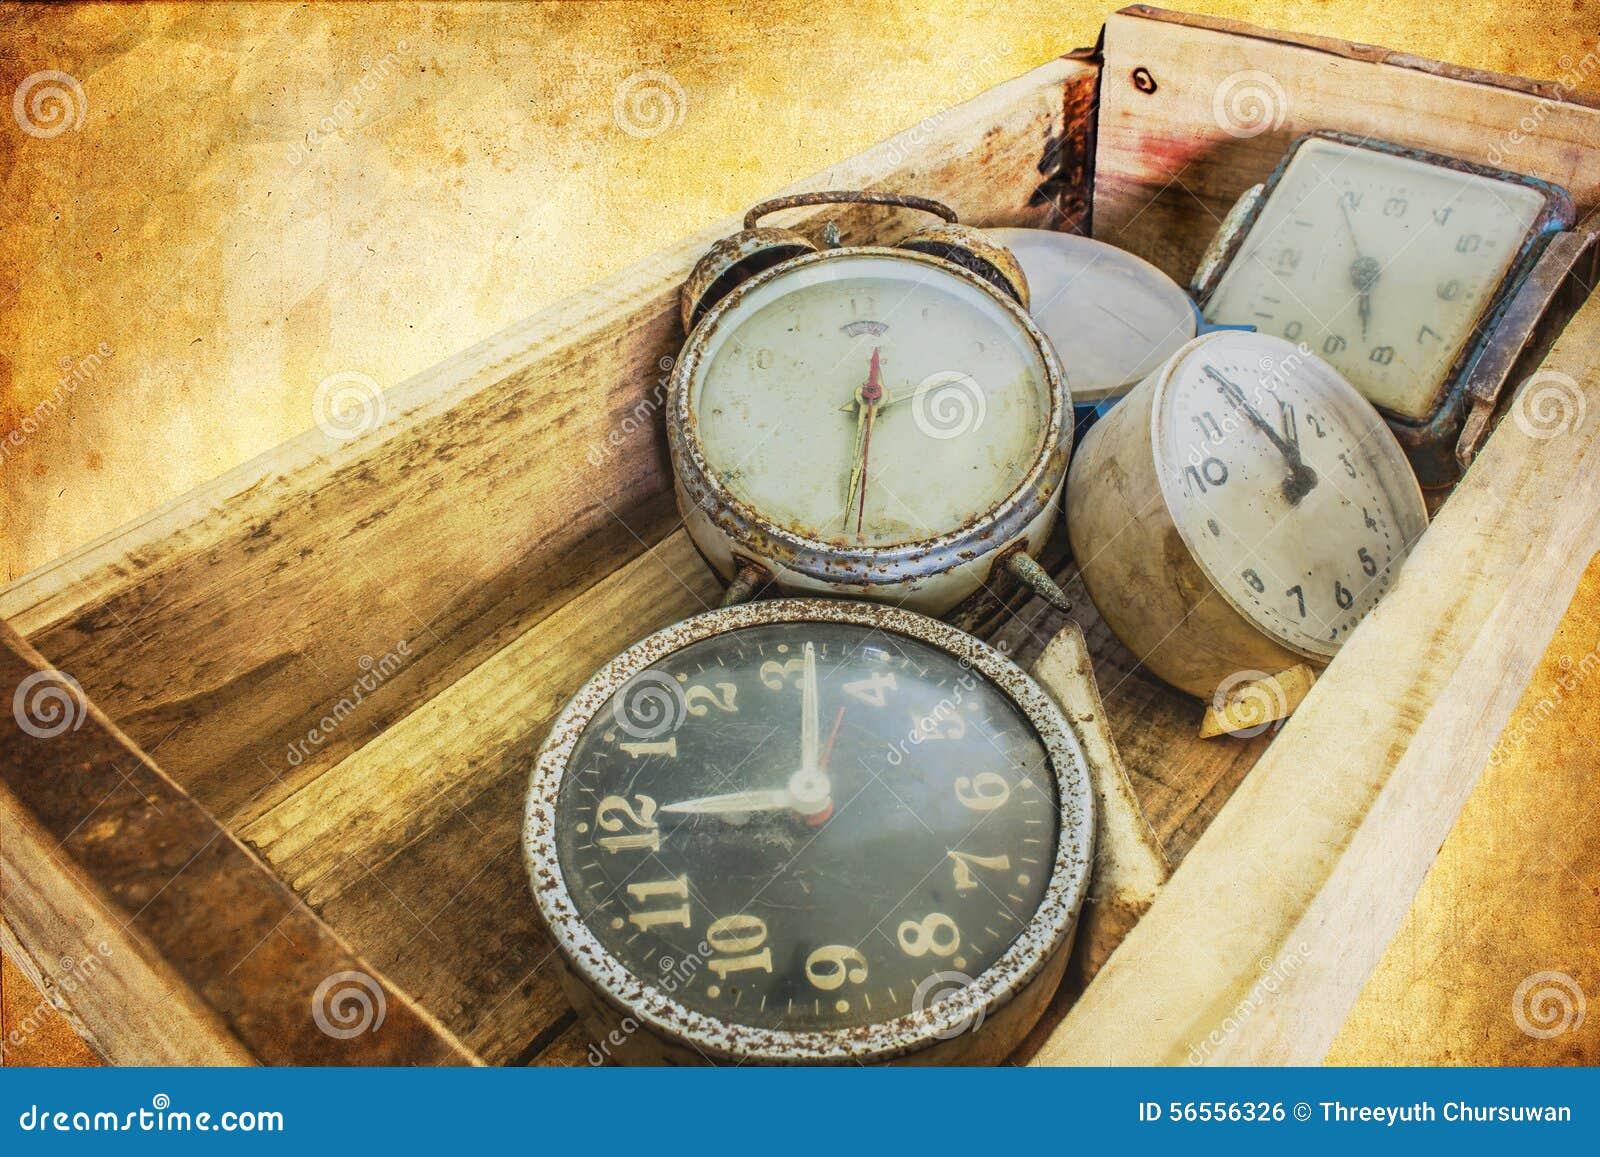 Download Παλαιό ρολόι στο αναδρομικό εκλεκτής ποιότητας υπόβαθρο τέχνης Στοκ Εικόνες - εικόνα από ρολόι, επιχείρηση: 56556326